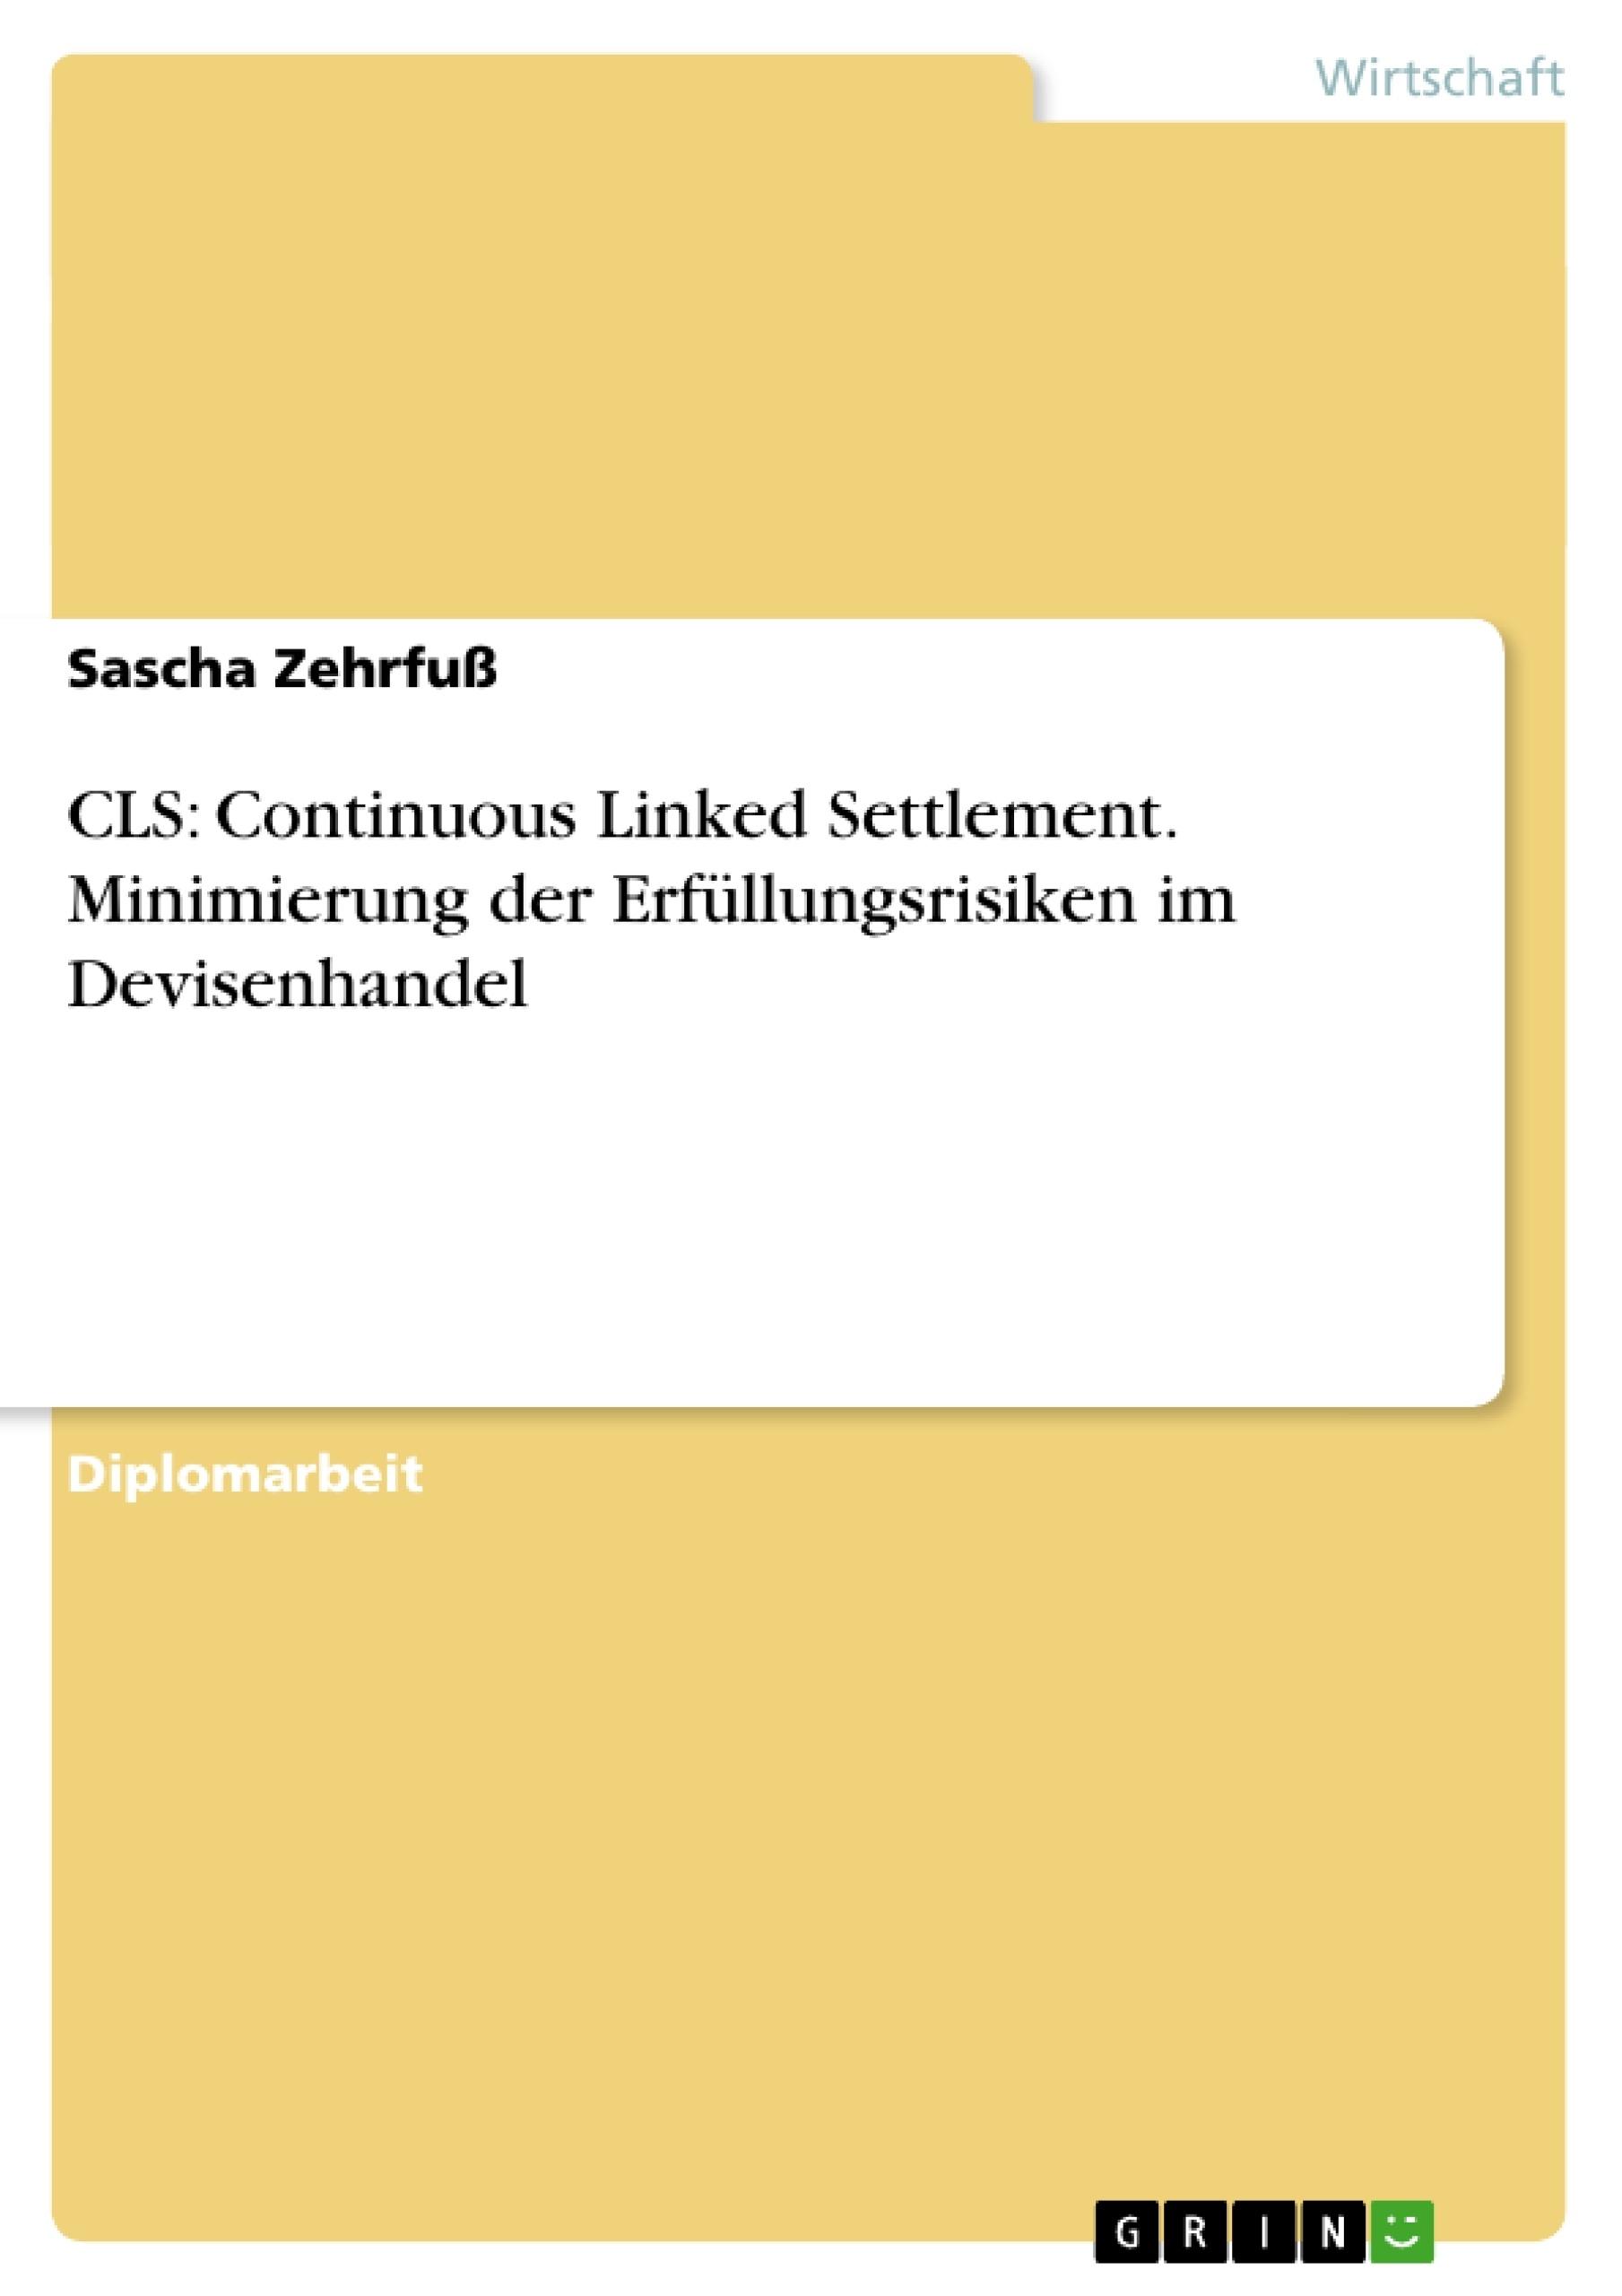 Titel: CLS: Continuous Linked Settlement. Minimierung der Erfüllungsrisiken im Devisenhandel